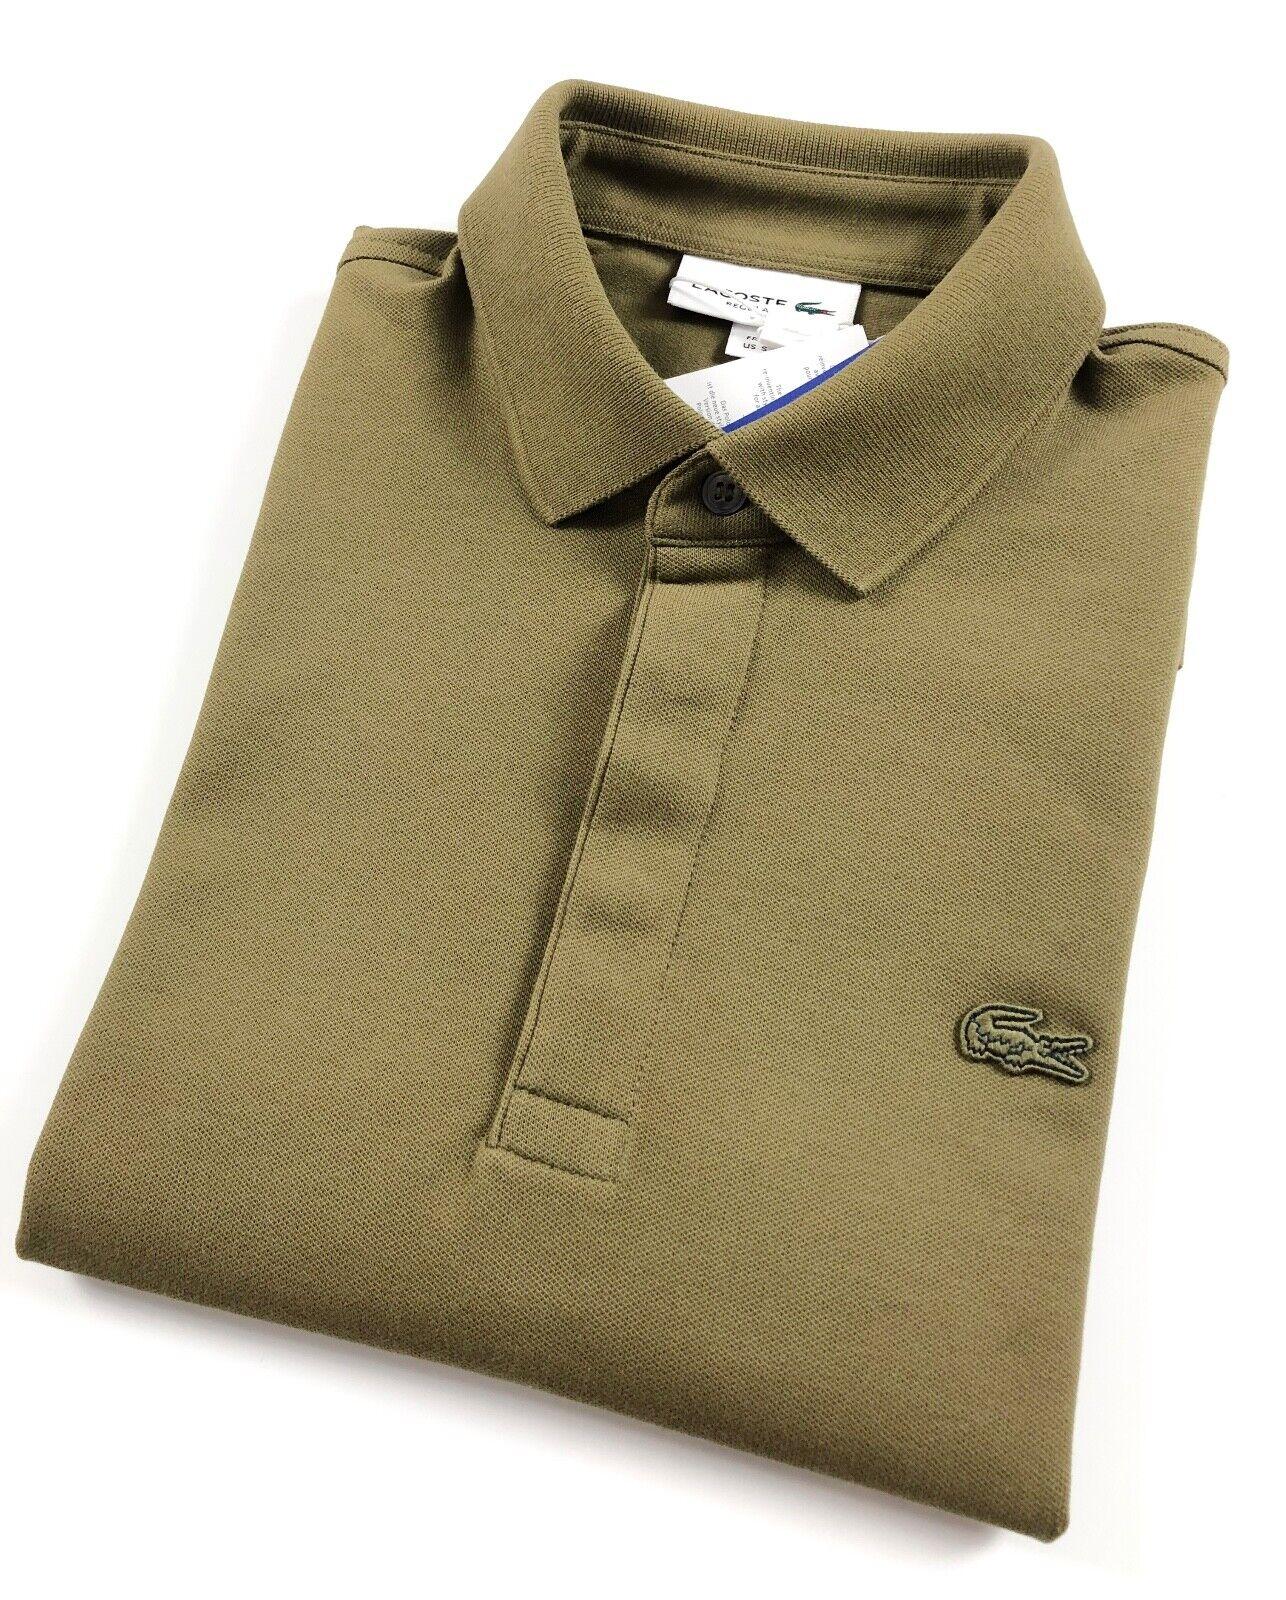 Maglietta Polo Lacoste Paris uomo Regular Fit Stretch piquet verde kaki PH552200UXF